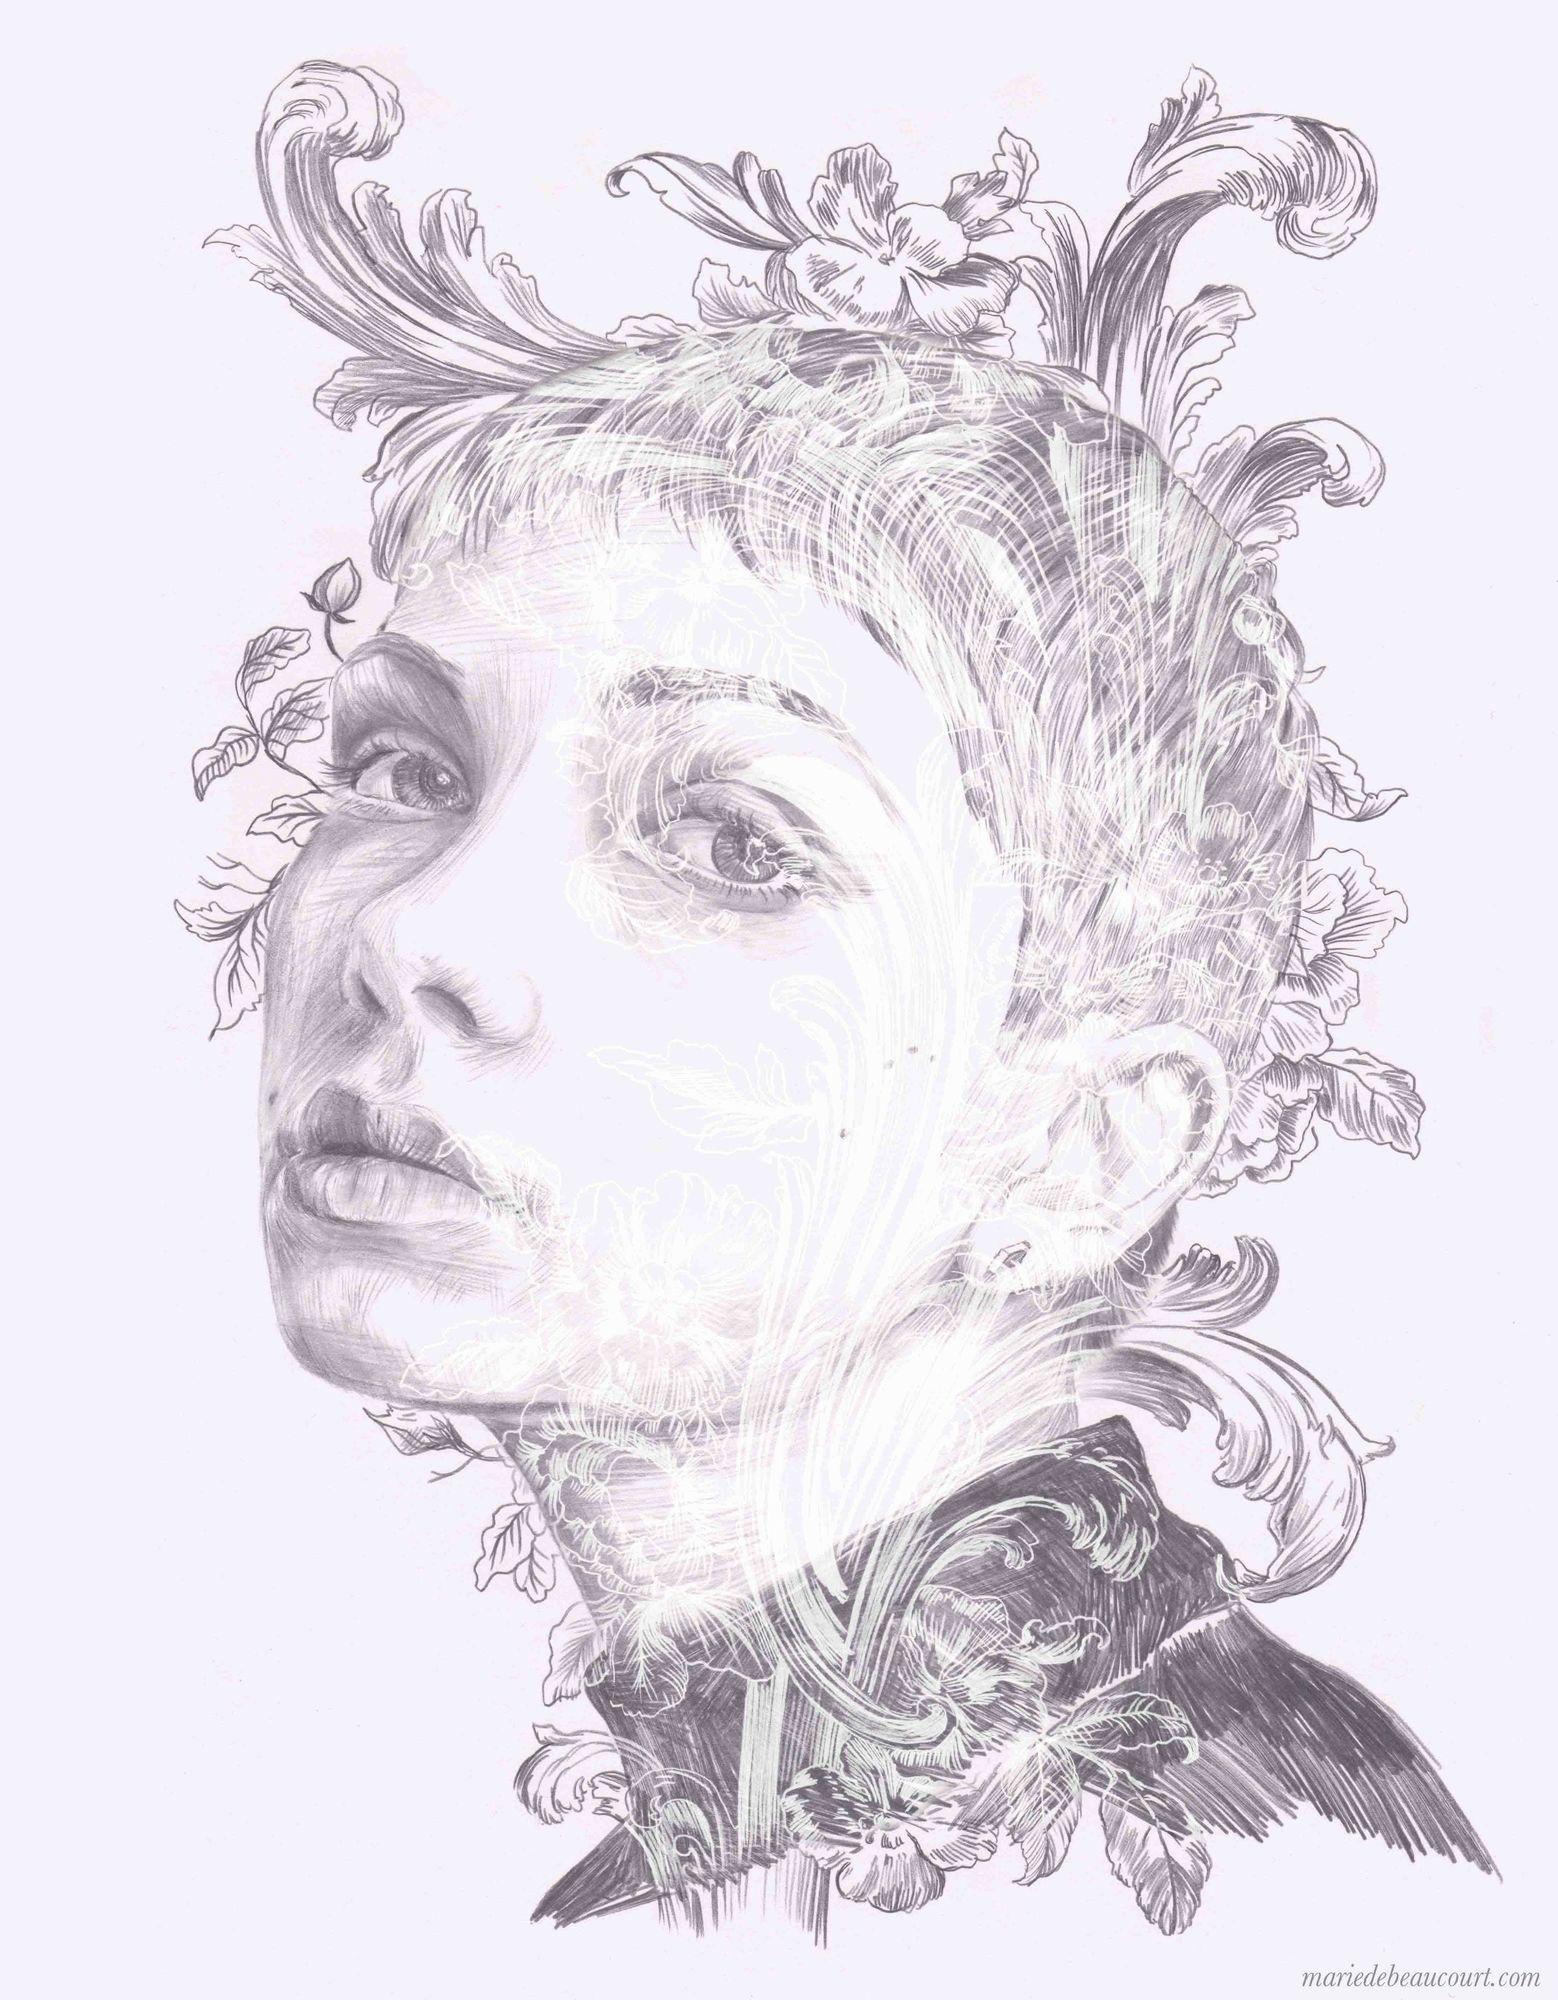 COSMOPOLA | Marie de Beaucourt portrait of Tavi Gevinson